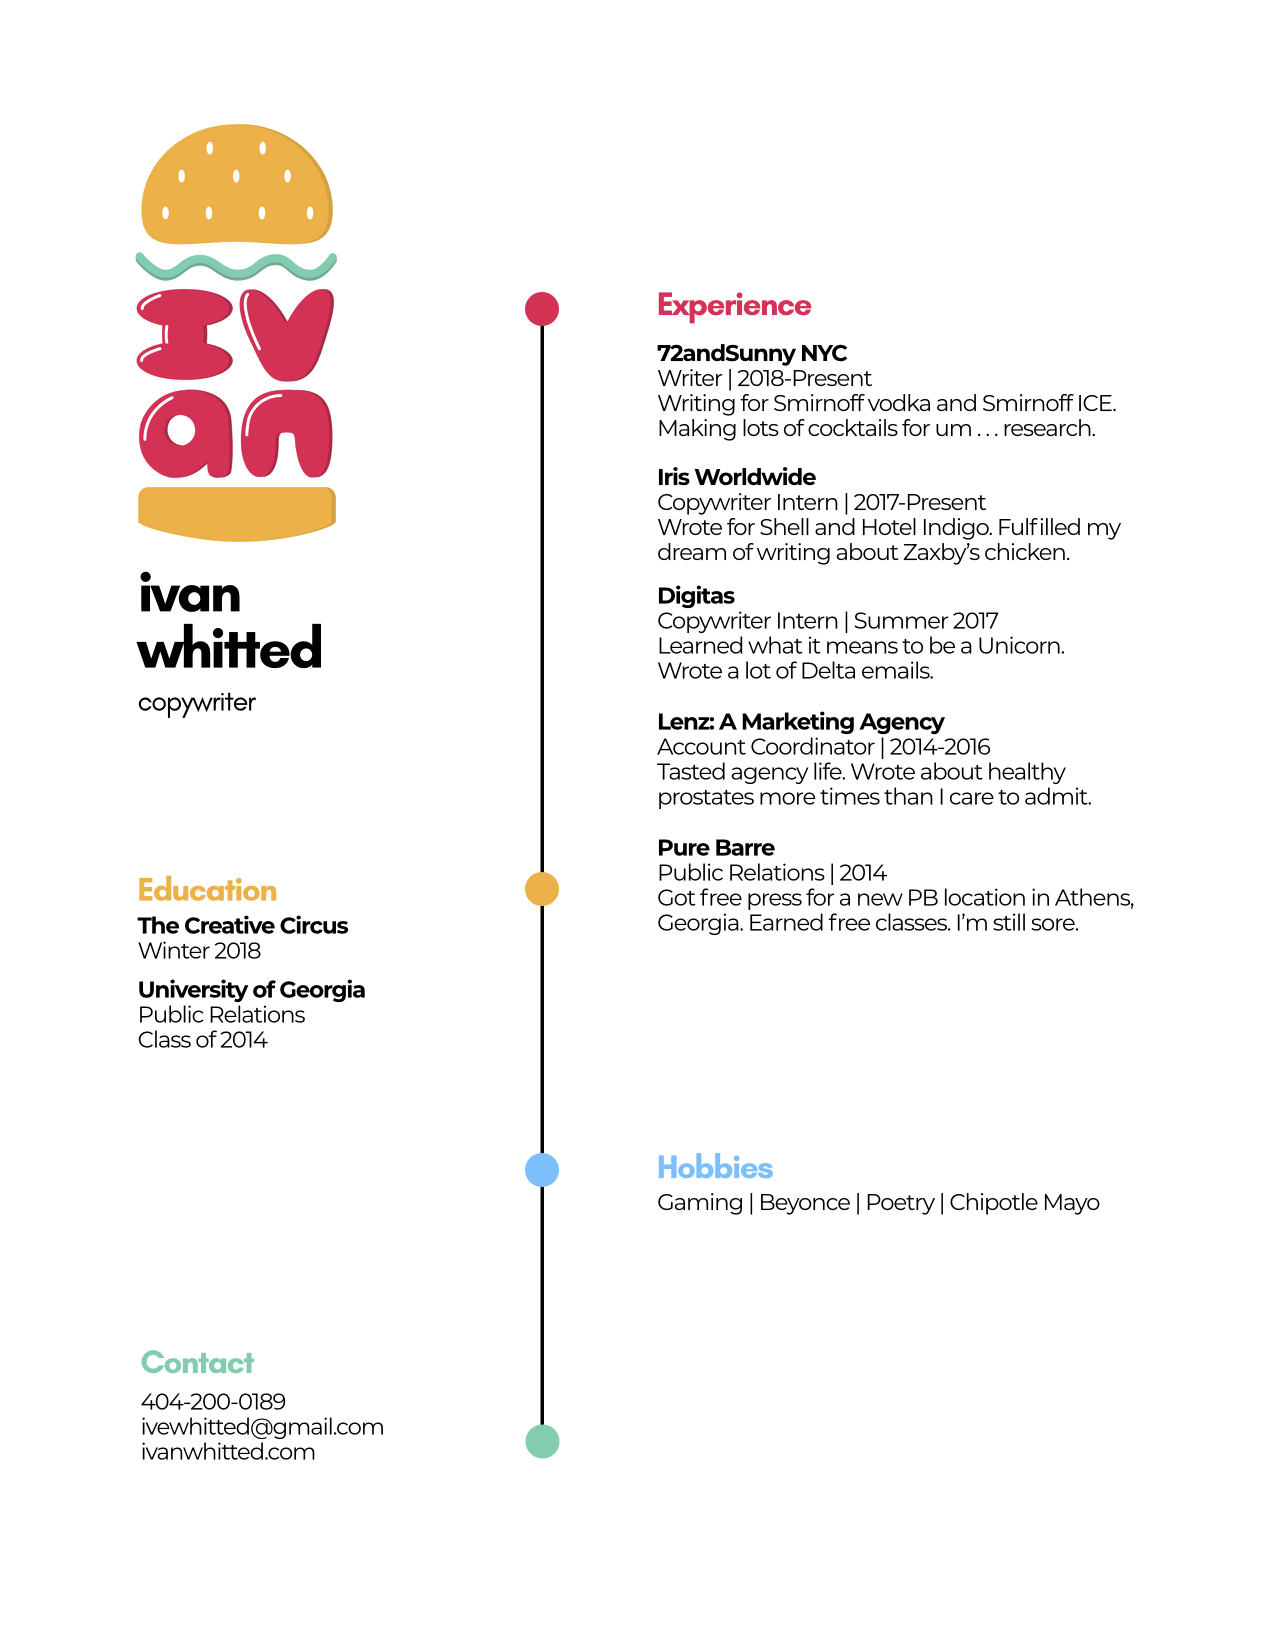 ivan resume may 6 2019.png